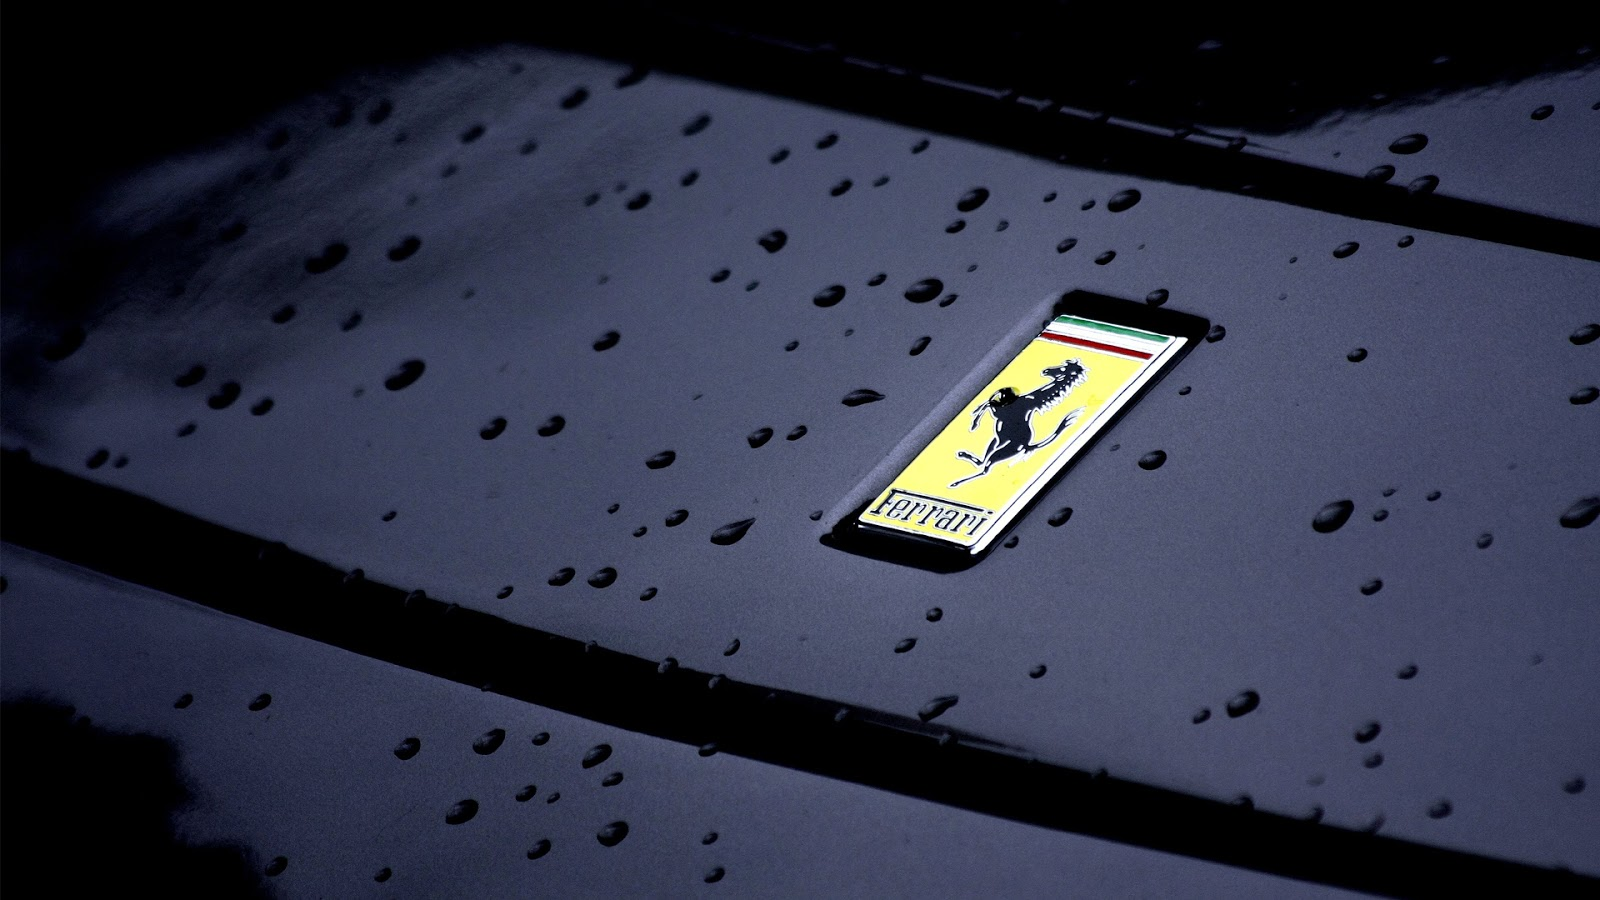 Ferrari Logo HD Wallpapers 1080p Free Download At HdwalleFerrari Full 1920x1080 Hdwalle